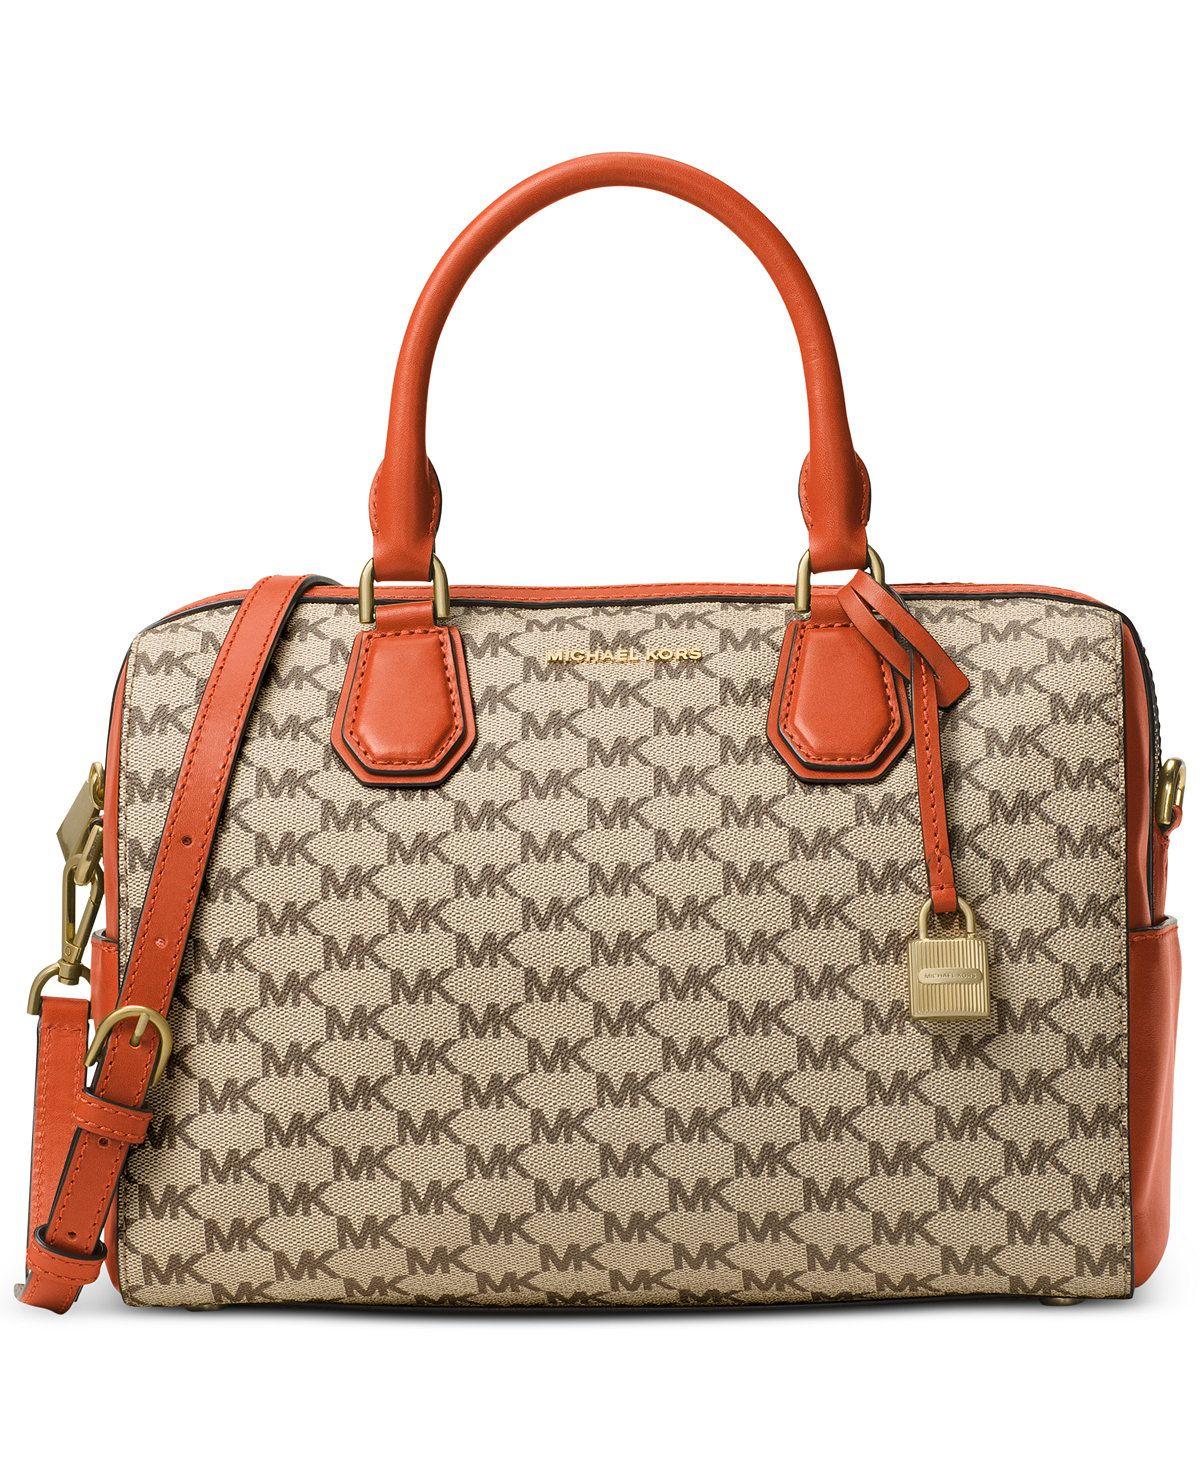 abe700ae41df MICHAEL Michael Kors Signature Mercer Medium Duffel - Designer Handbags -  Handbags & Accessories - Macy's